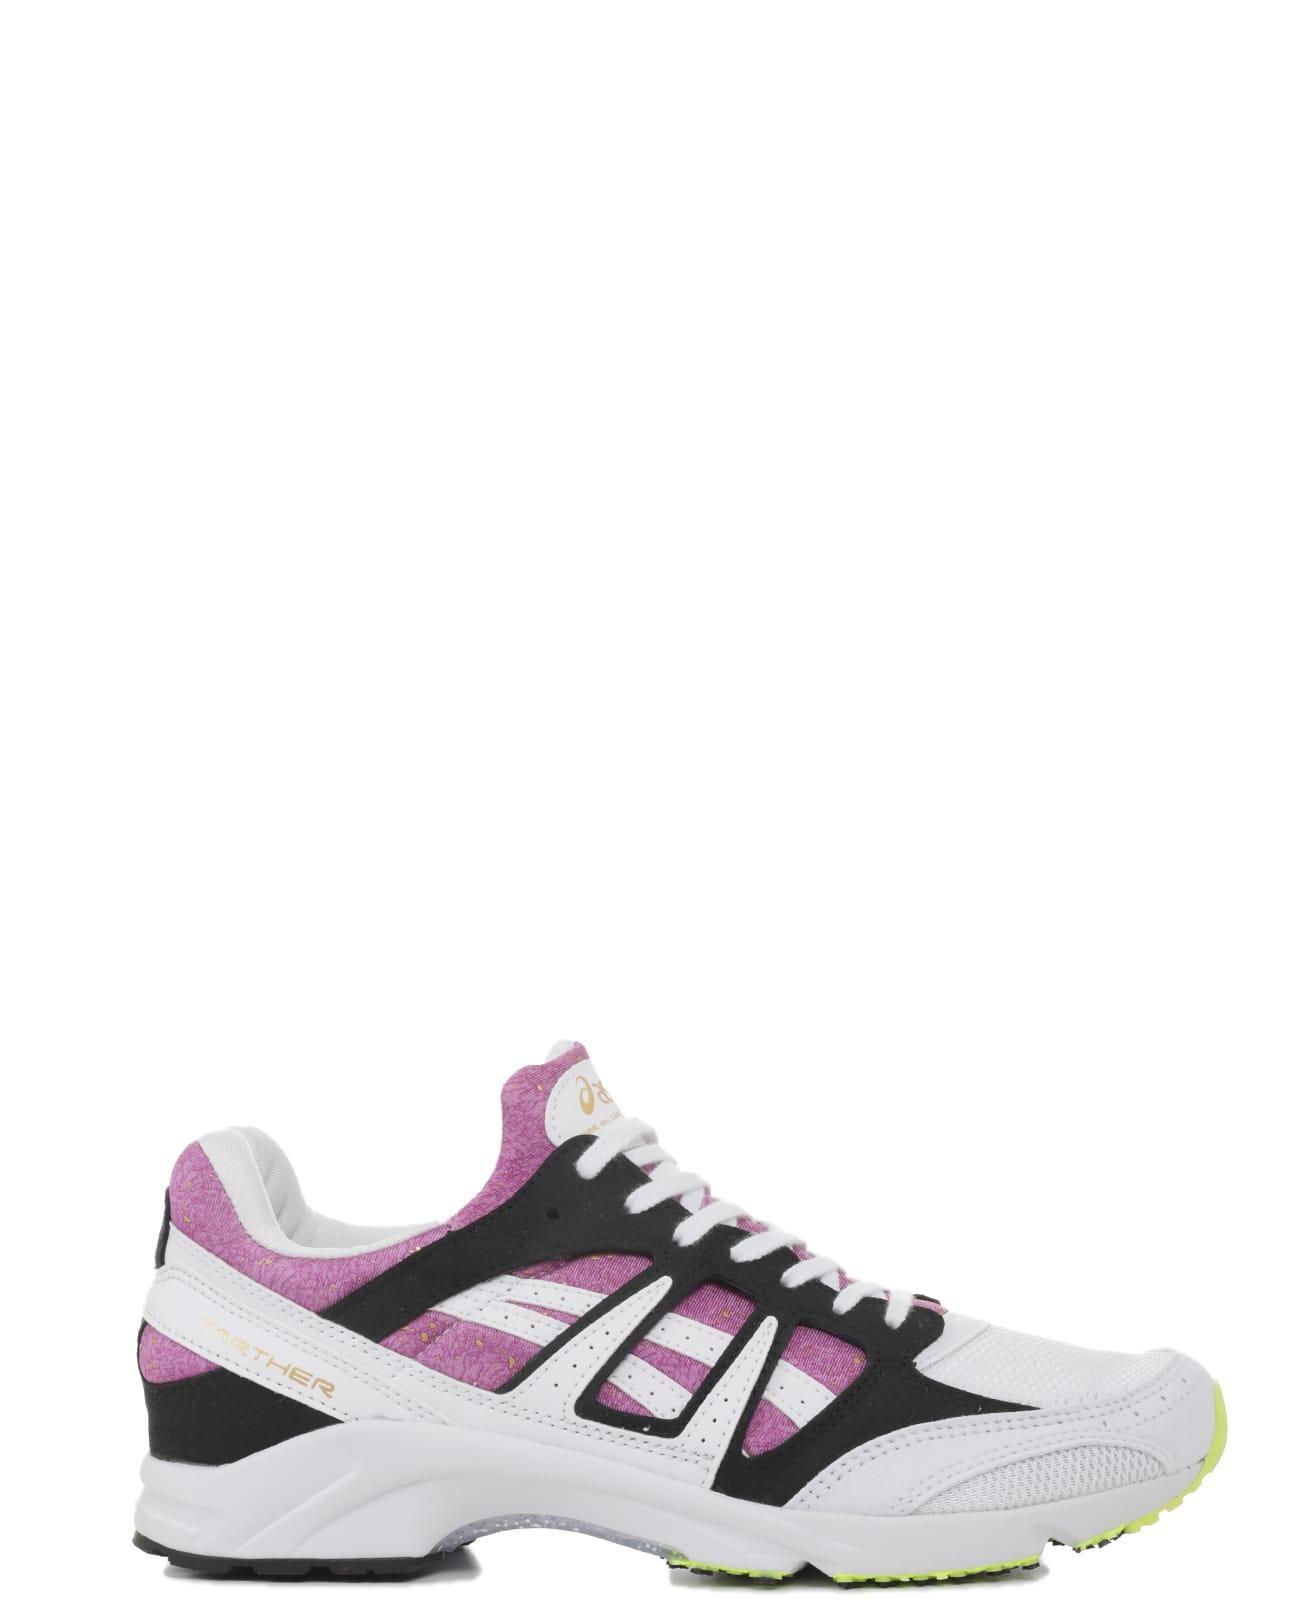 Comme Des Garçons Shirt Sneakers COMME DES GARÇONS SHIRT X ASICS TARTHER SD PINK AND WHITE SNEAKERS